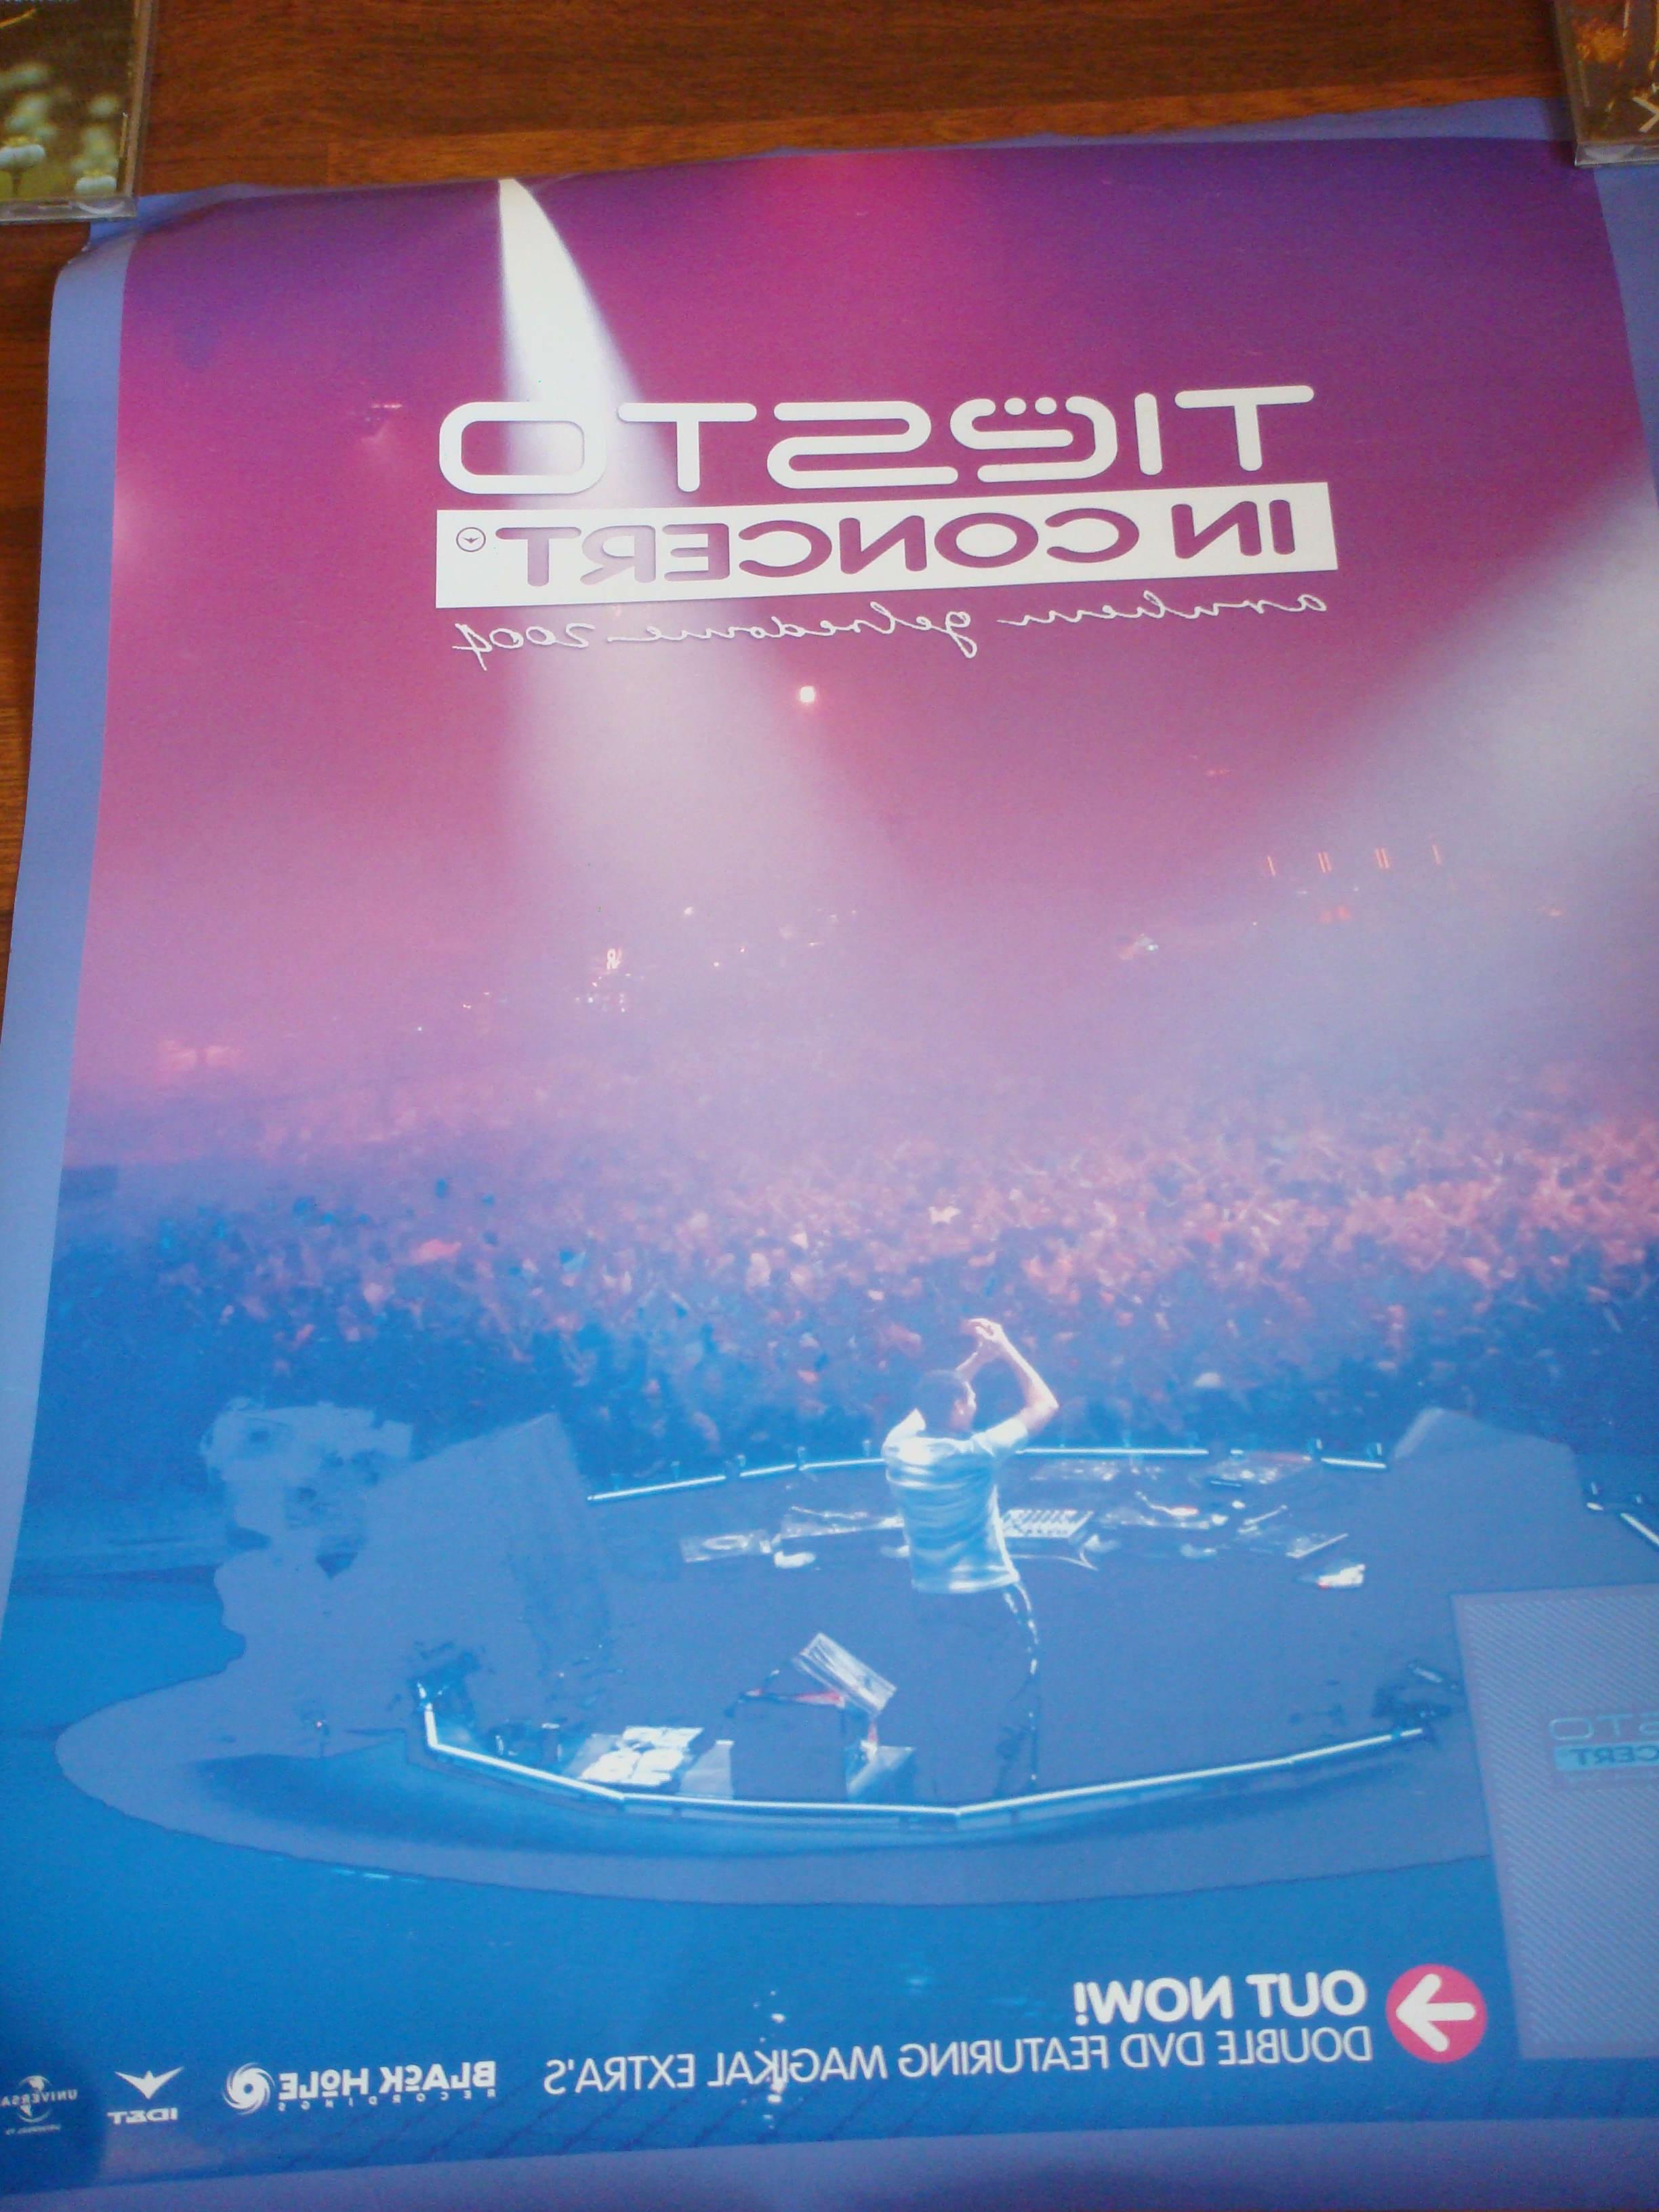 Tiesto in Concert 2004 Special Display Poster